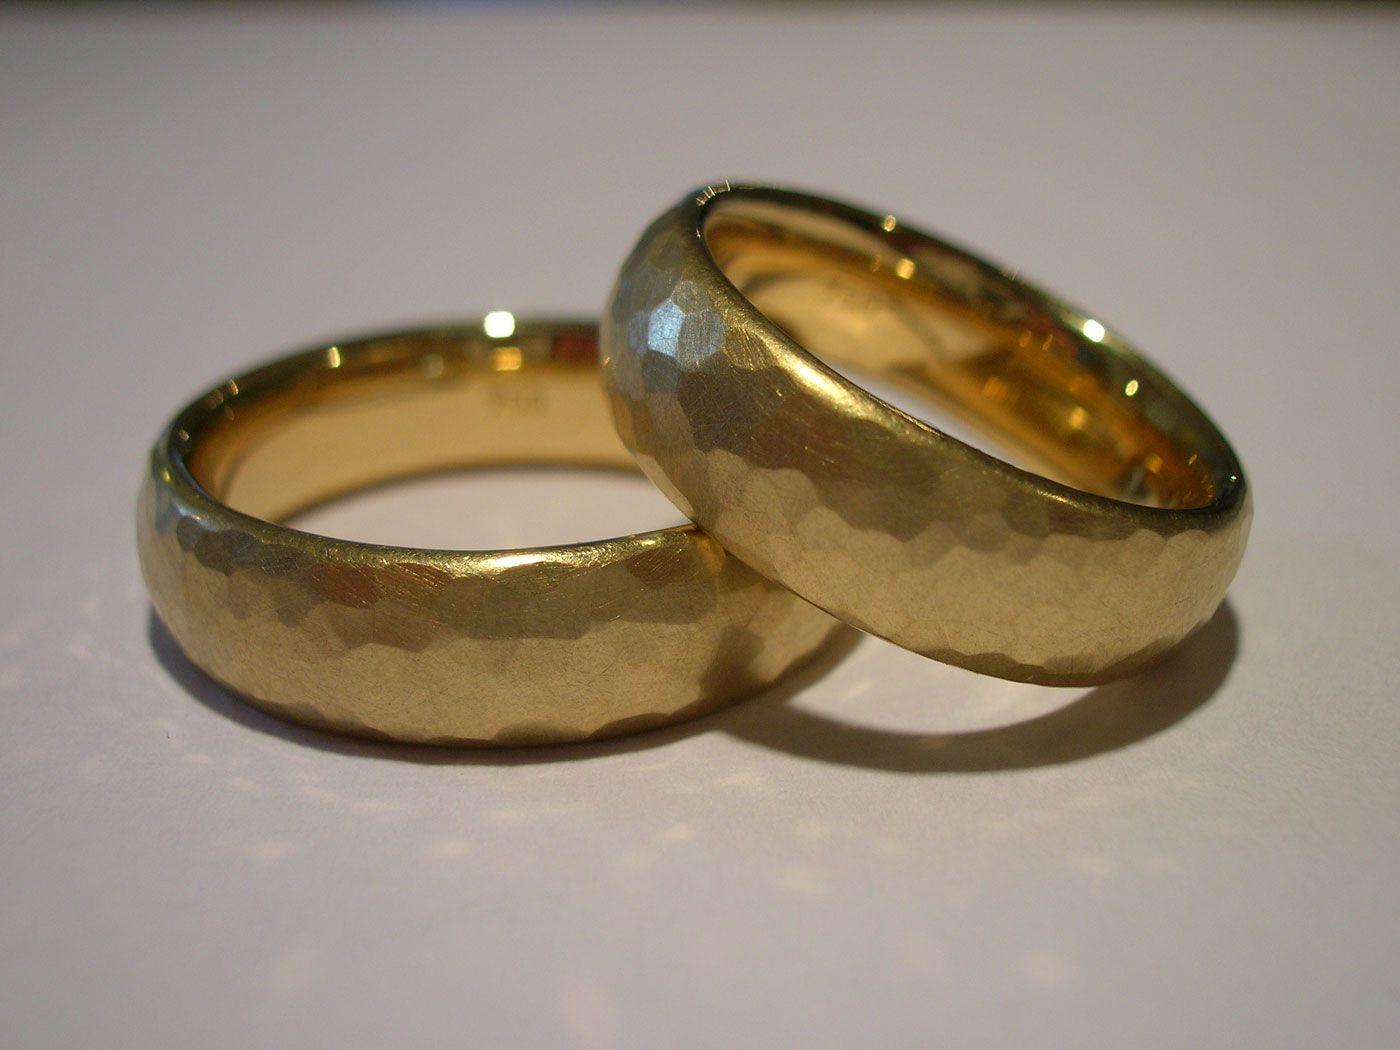 Eheringe gold matt gebürstet  rings : berlin Material: 750-er Gold mit Hammerschlag | Trauringe ...